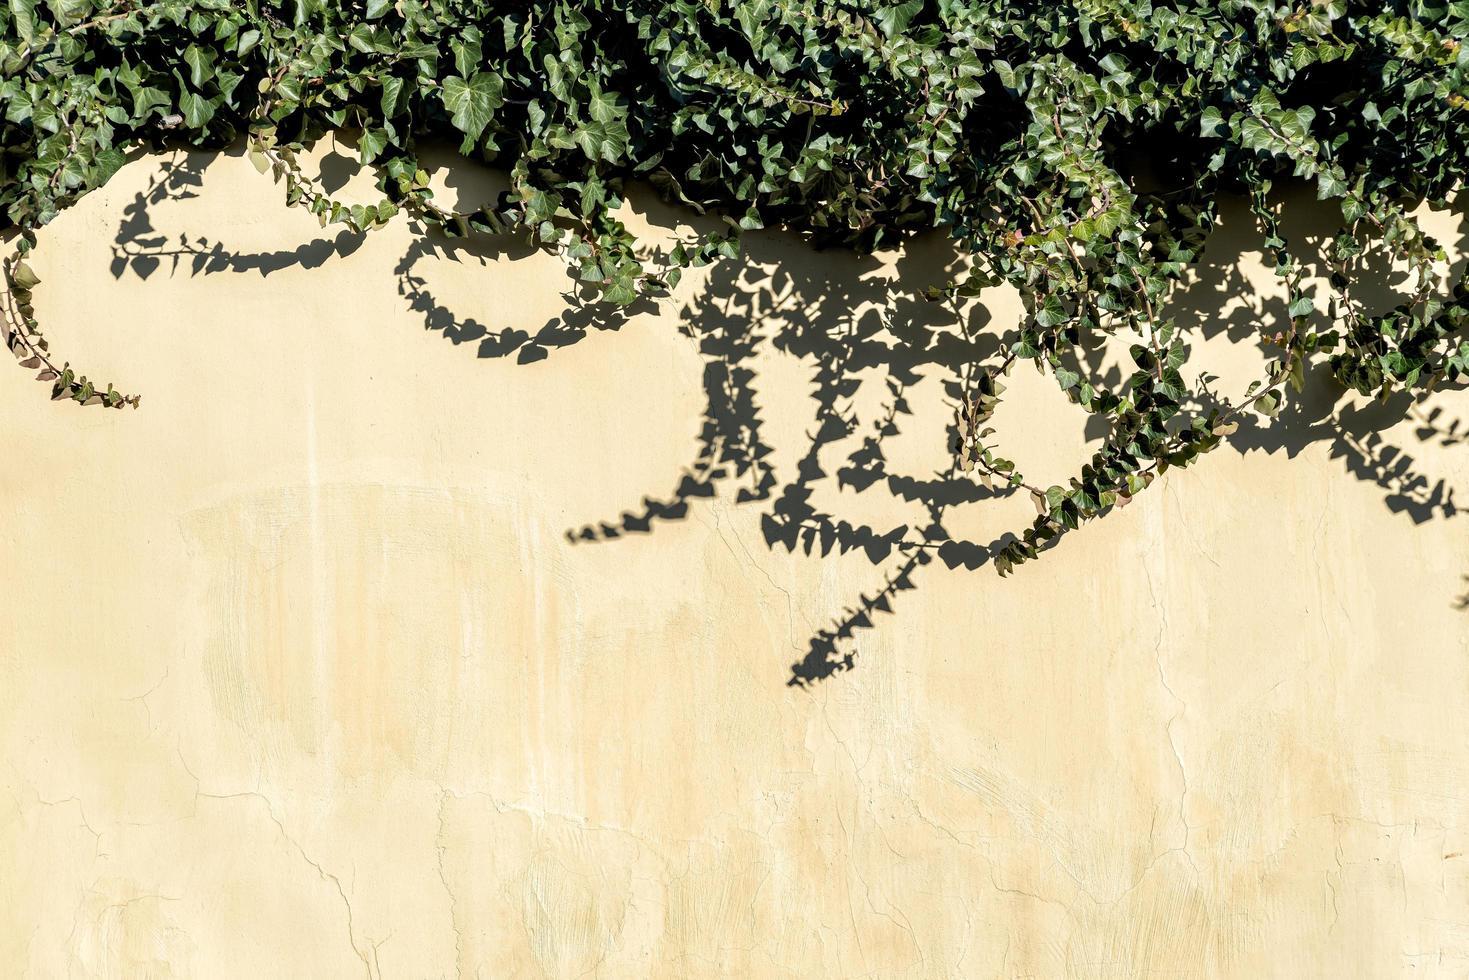 mur avec du lierre luxuriant photo